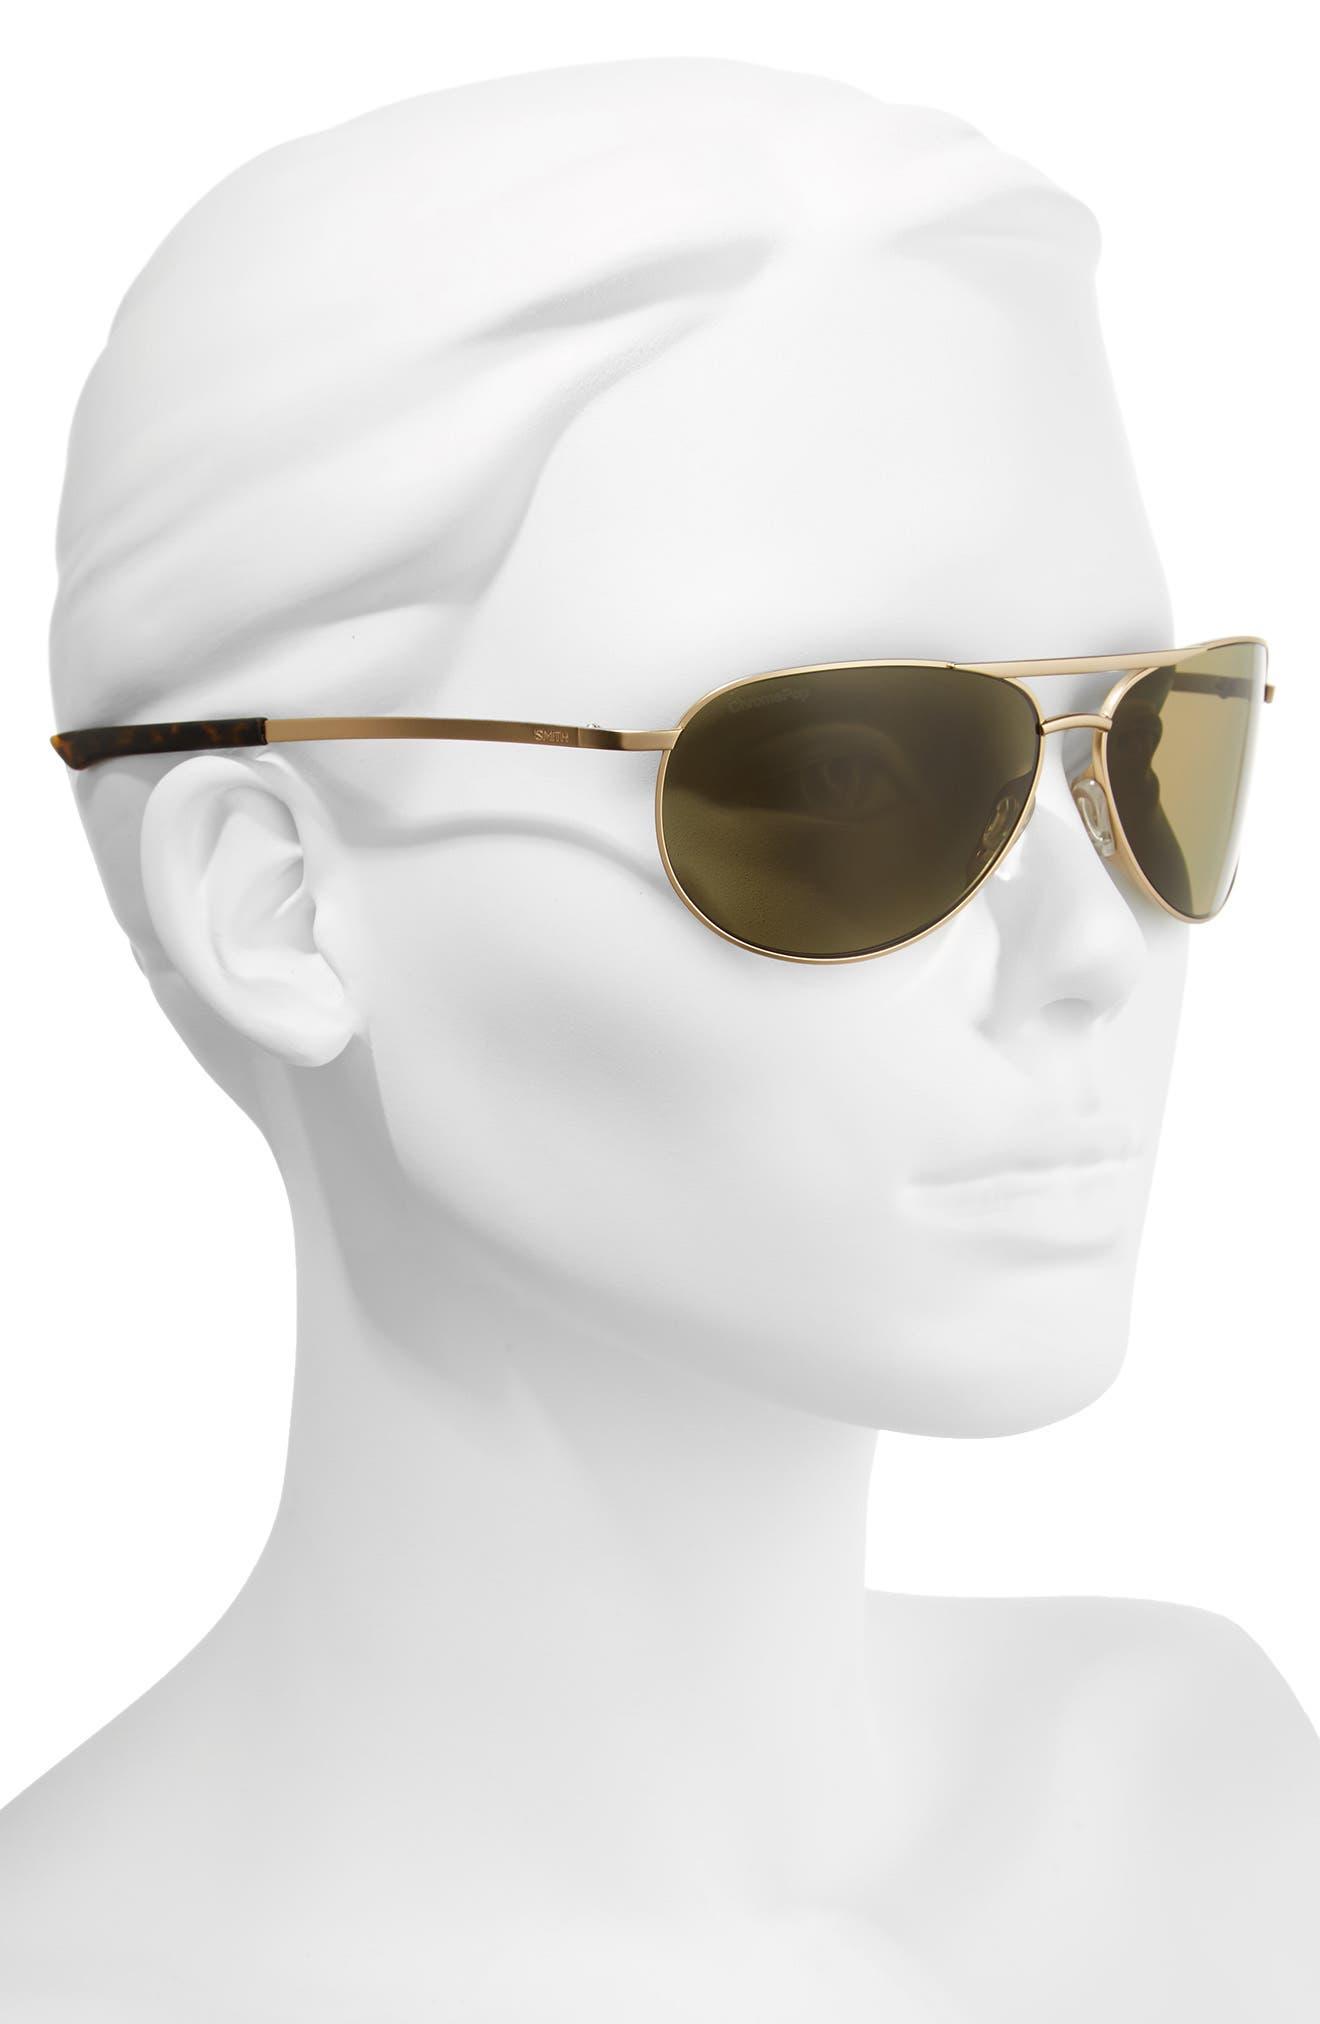 Serpico Slim 2.0 60mm ChromaPop Polarized Aviator Sunglasses,                             Alternate thumbnail 2, color,                             Gold/ Brown Polar